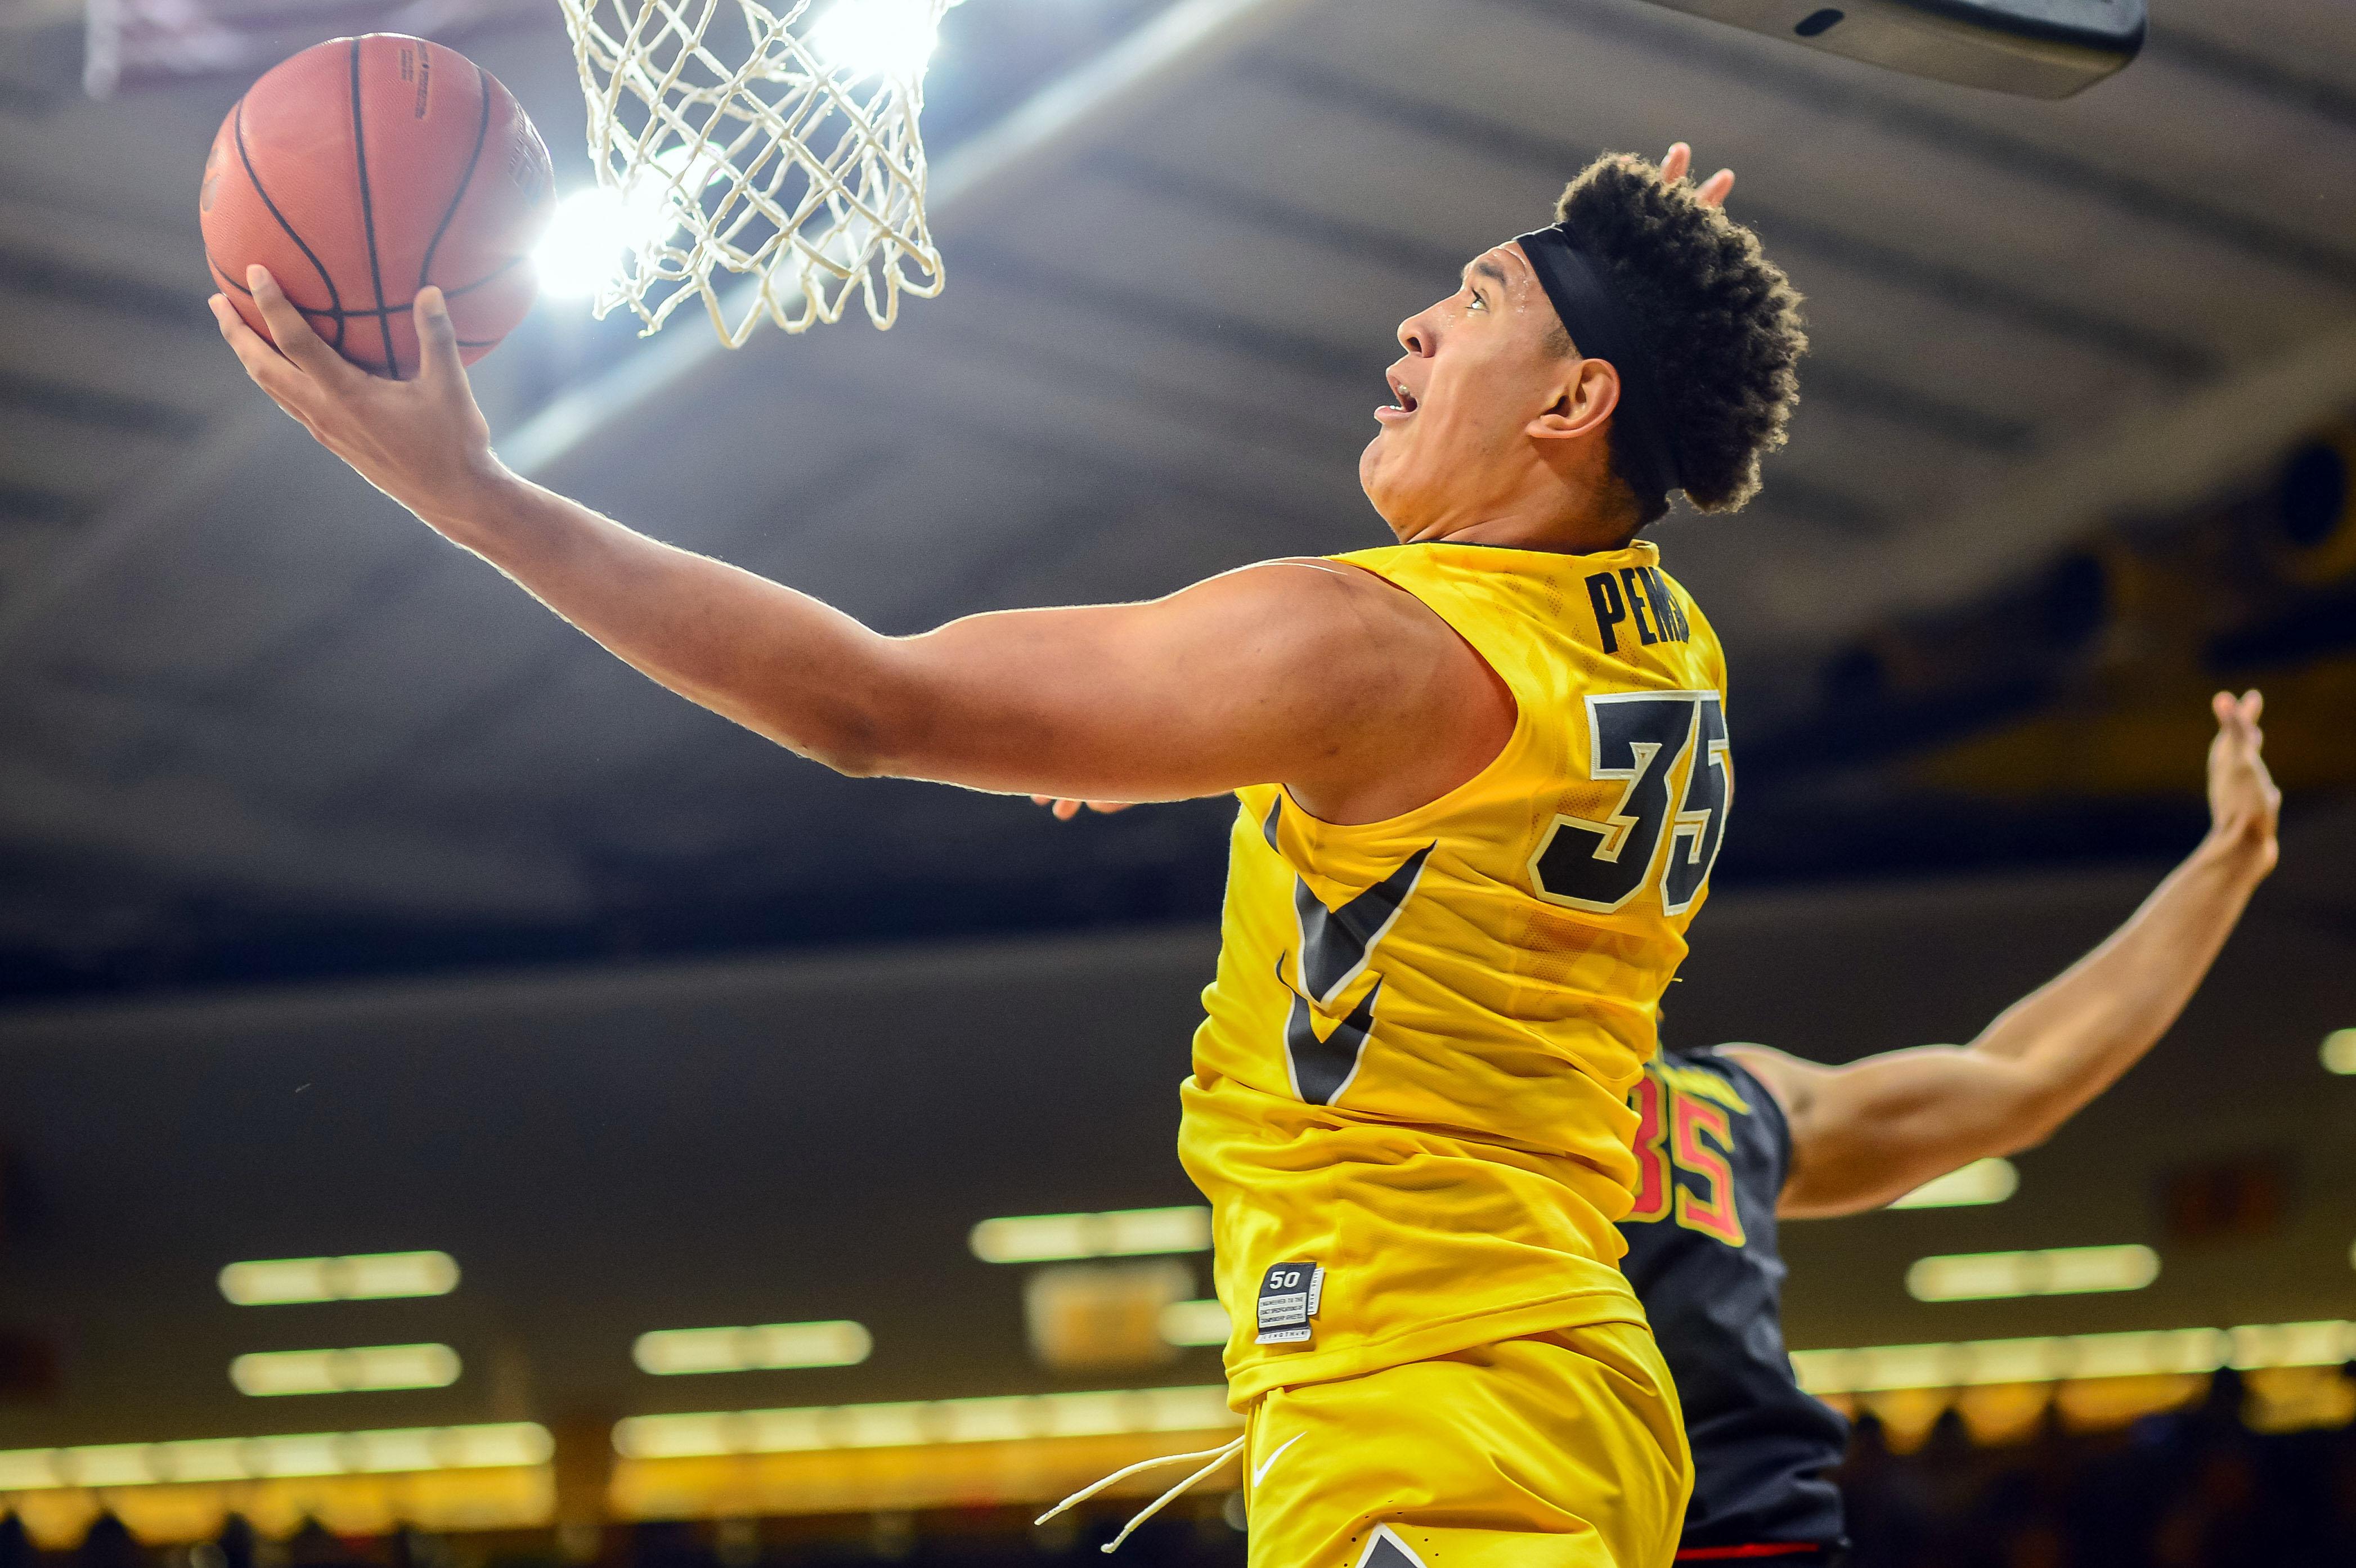 iowa basketball - photo #26